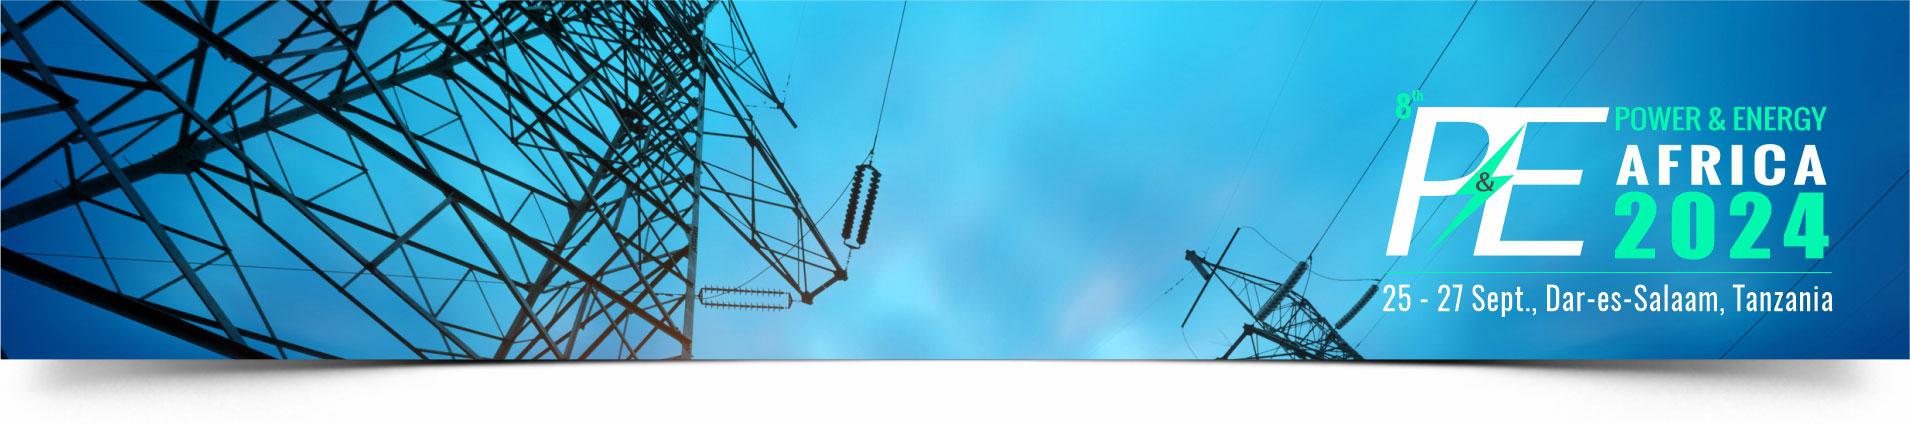 Exhibitor List | Power & Energy Tanzania 2019